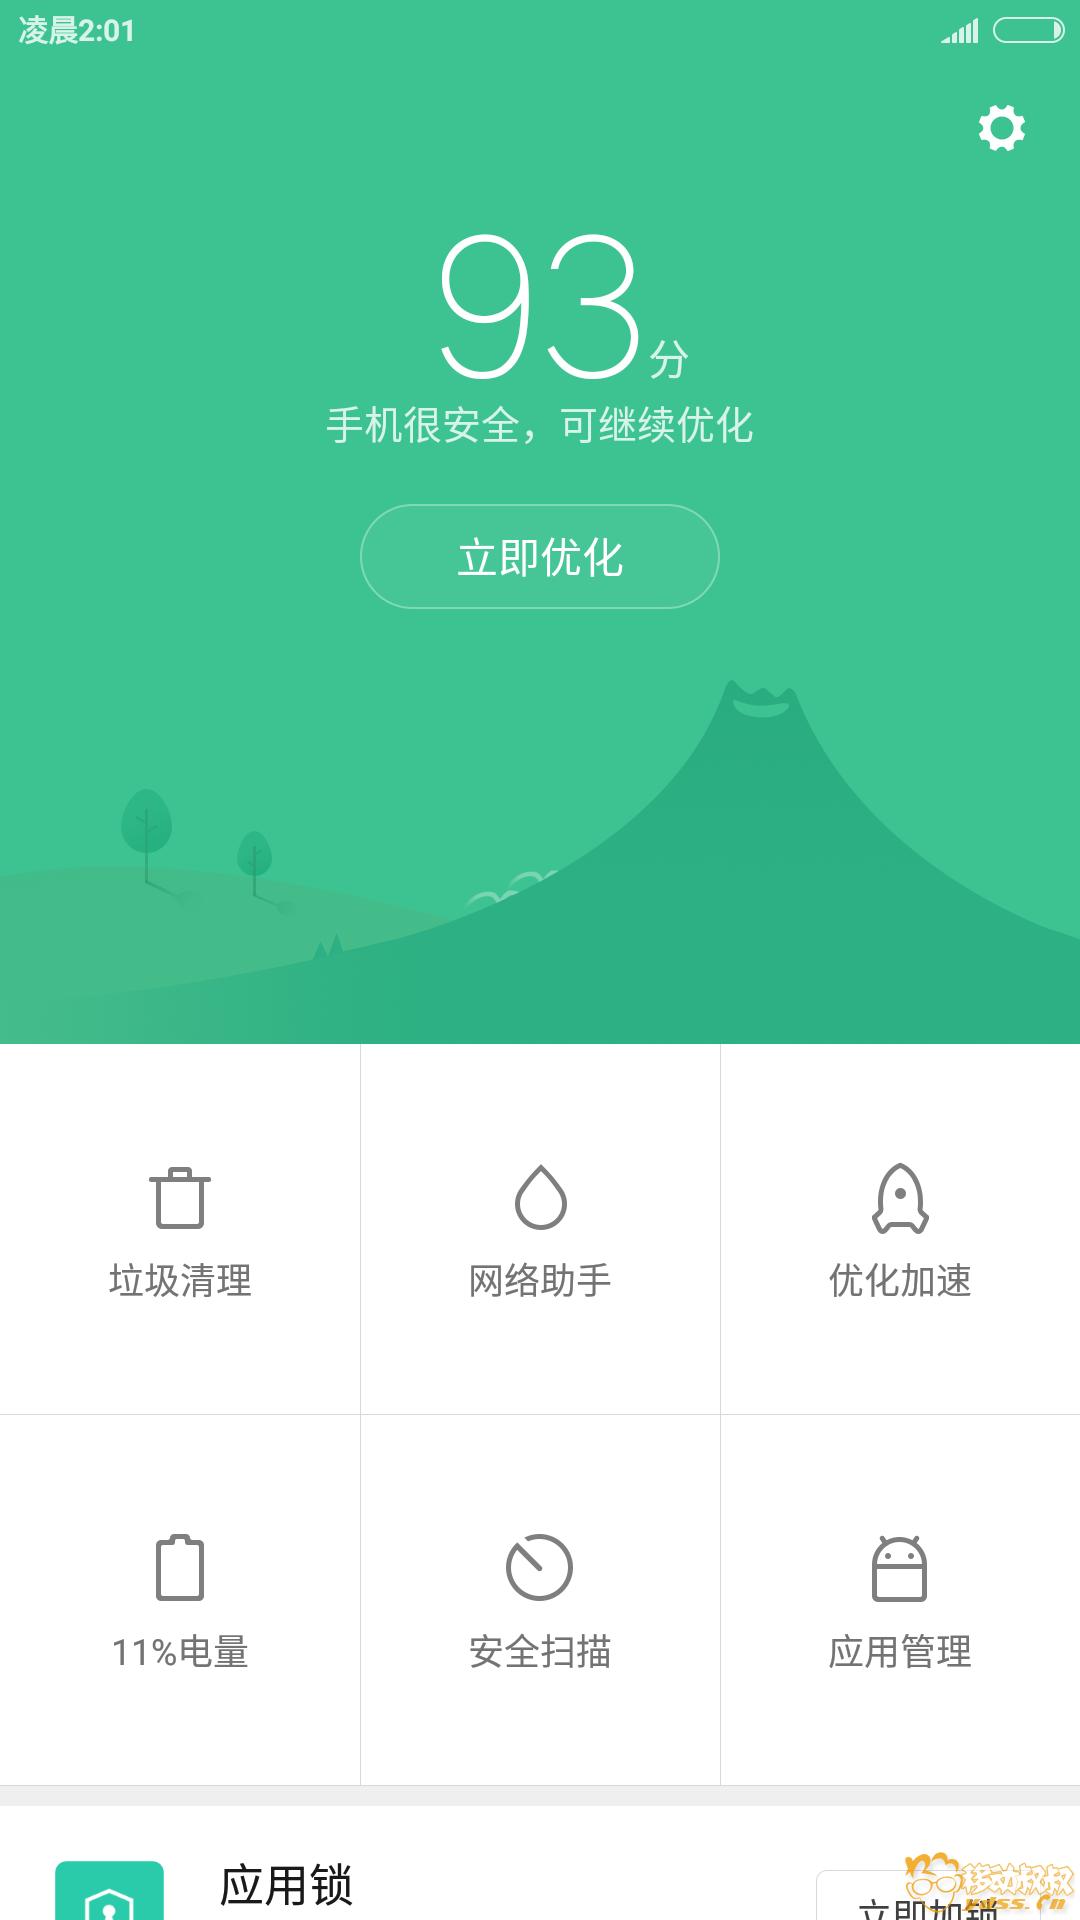 Screenshot_2018-01-29-02-01-55-509_com.miui.secur.png